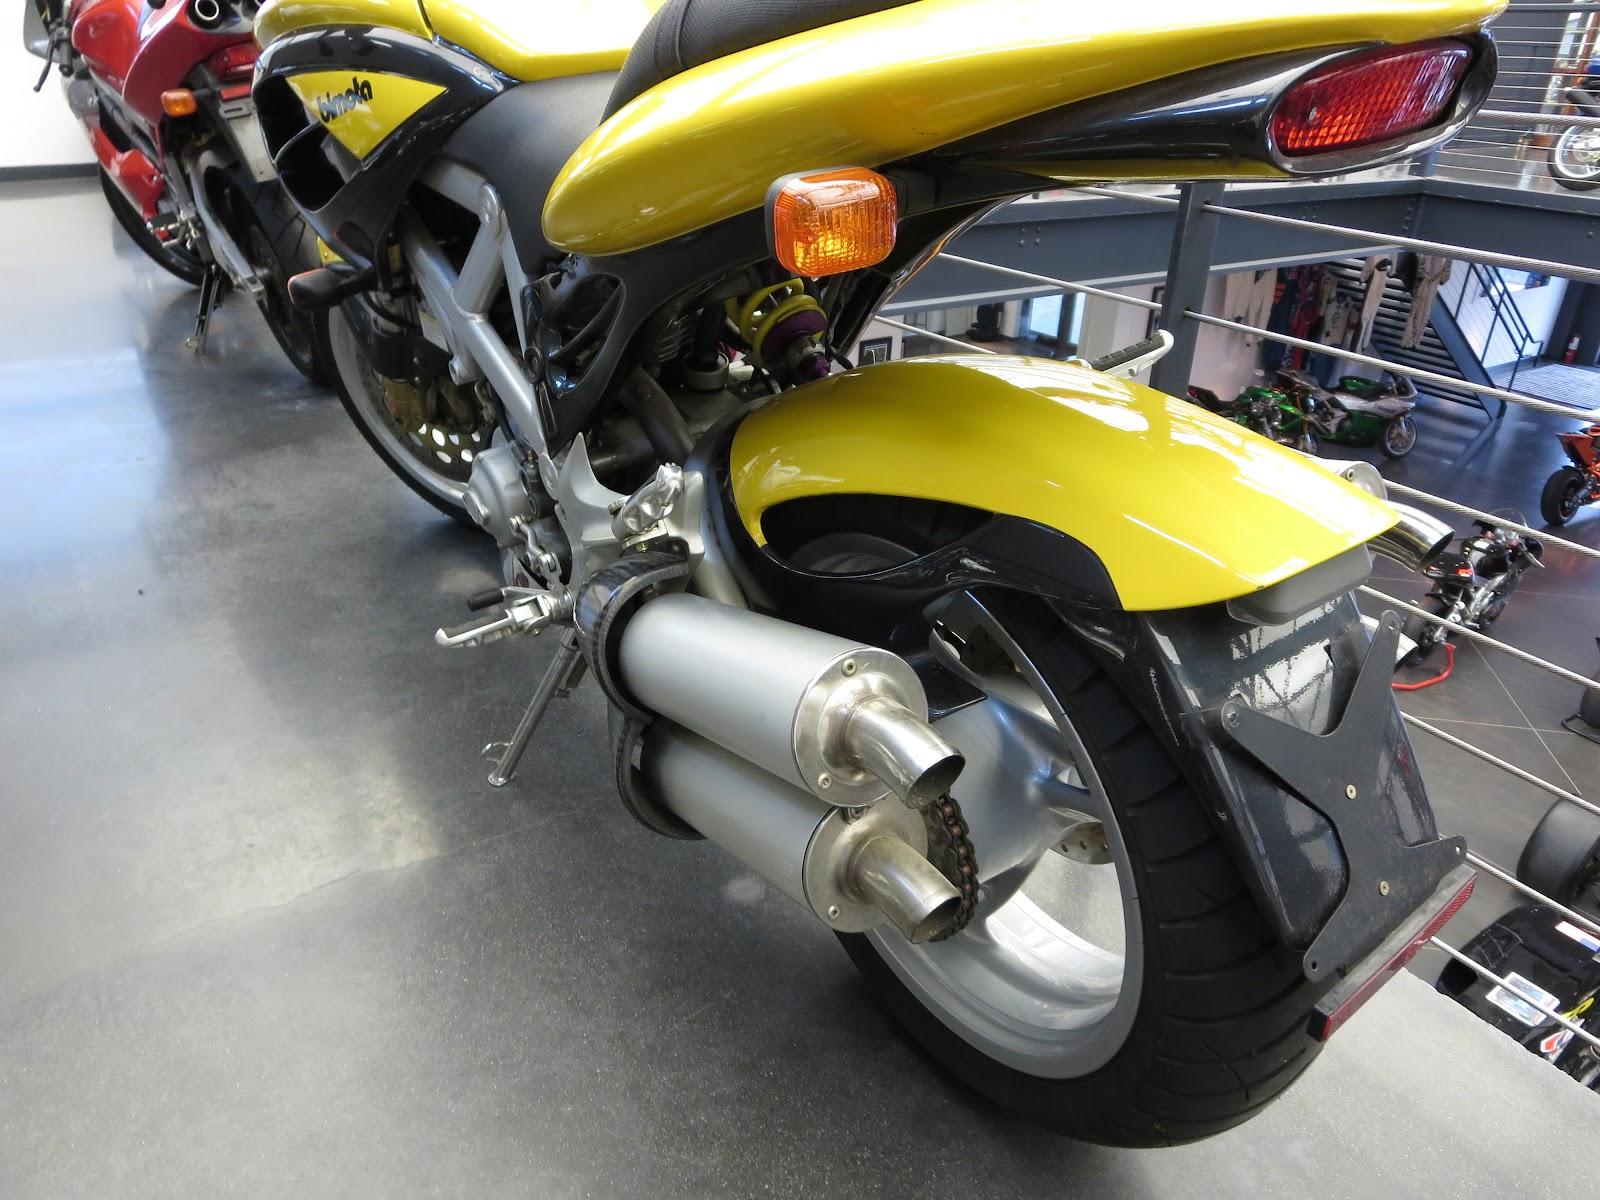 Oddbike Bimota Db3 Much Maligned Mantra Ducati 749 Fuse Box Rear